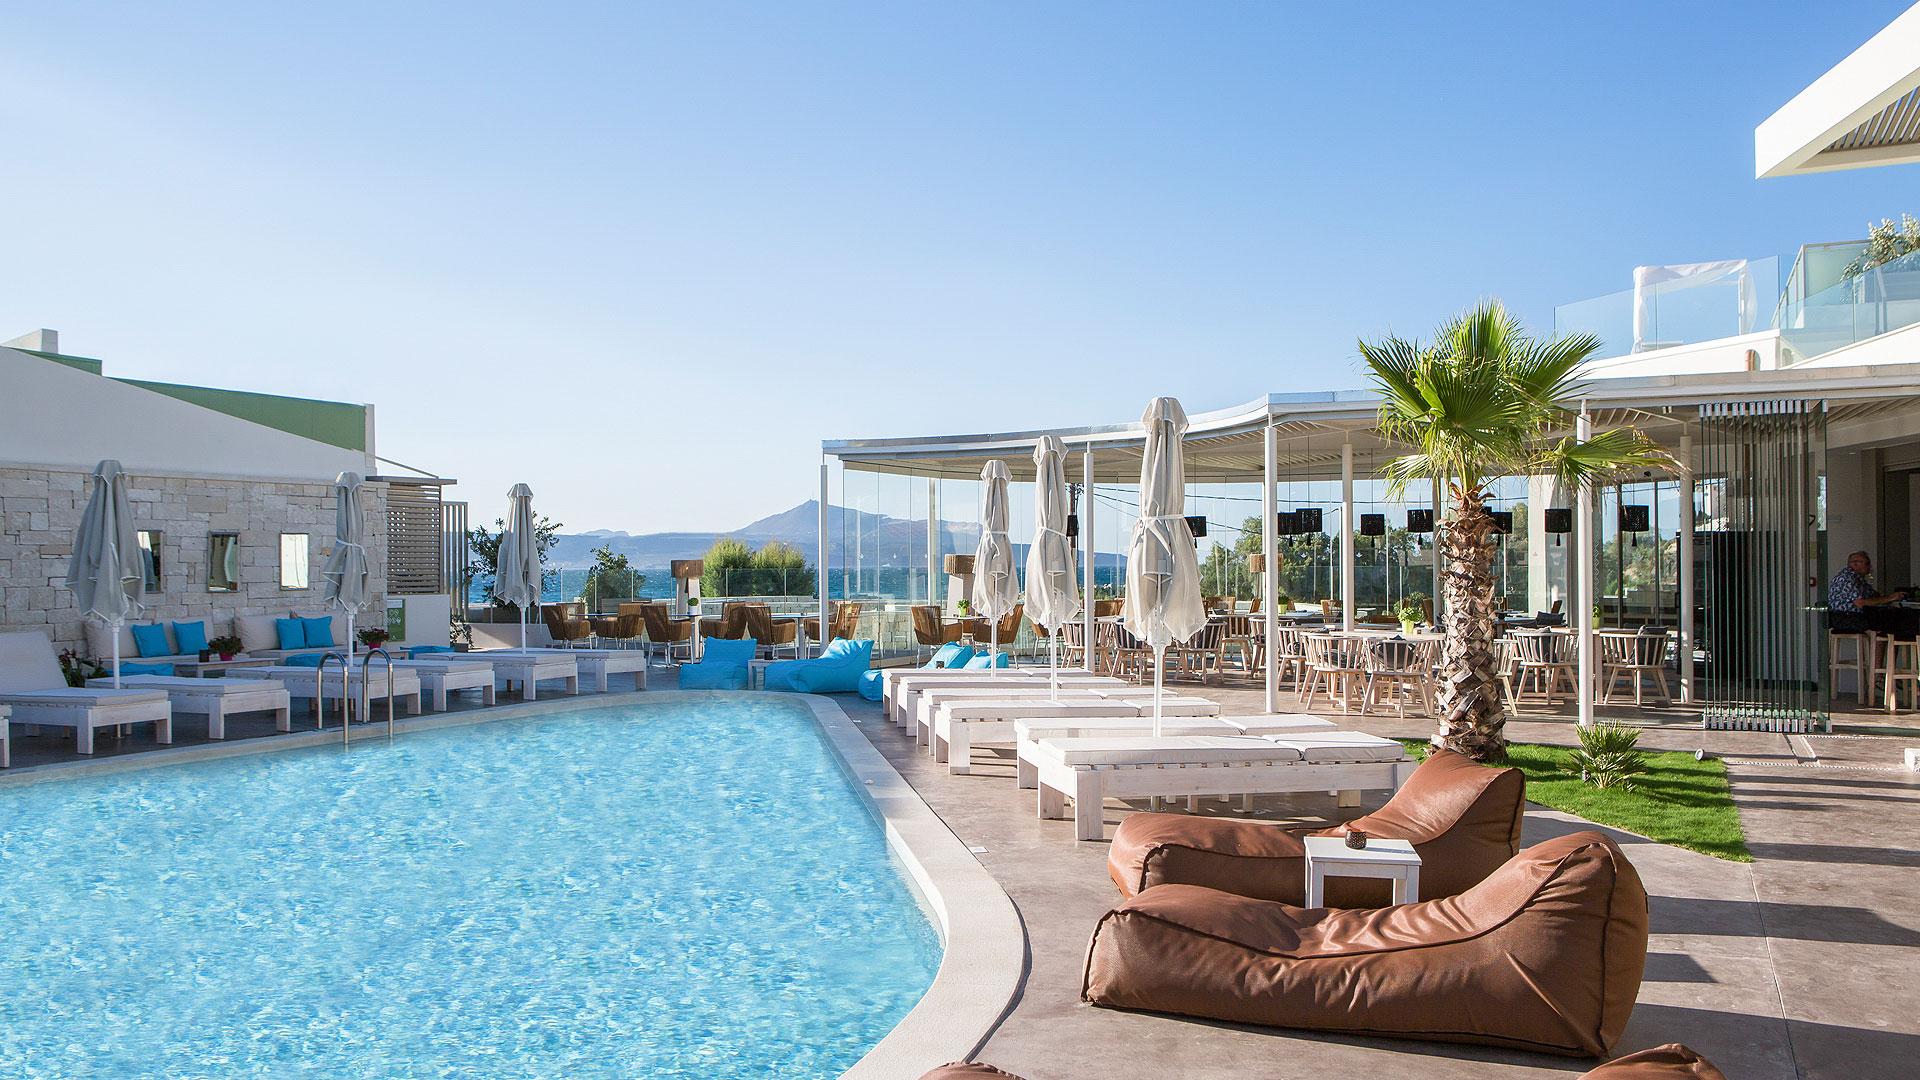 Aloe Boutique Hotel & Suites Ξενοδοχείο 5 Αστέρων Αλμυρίδα